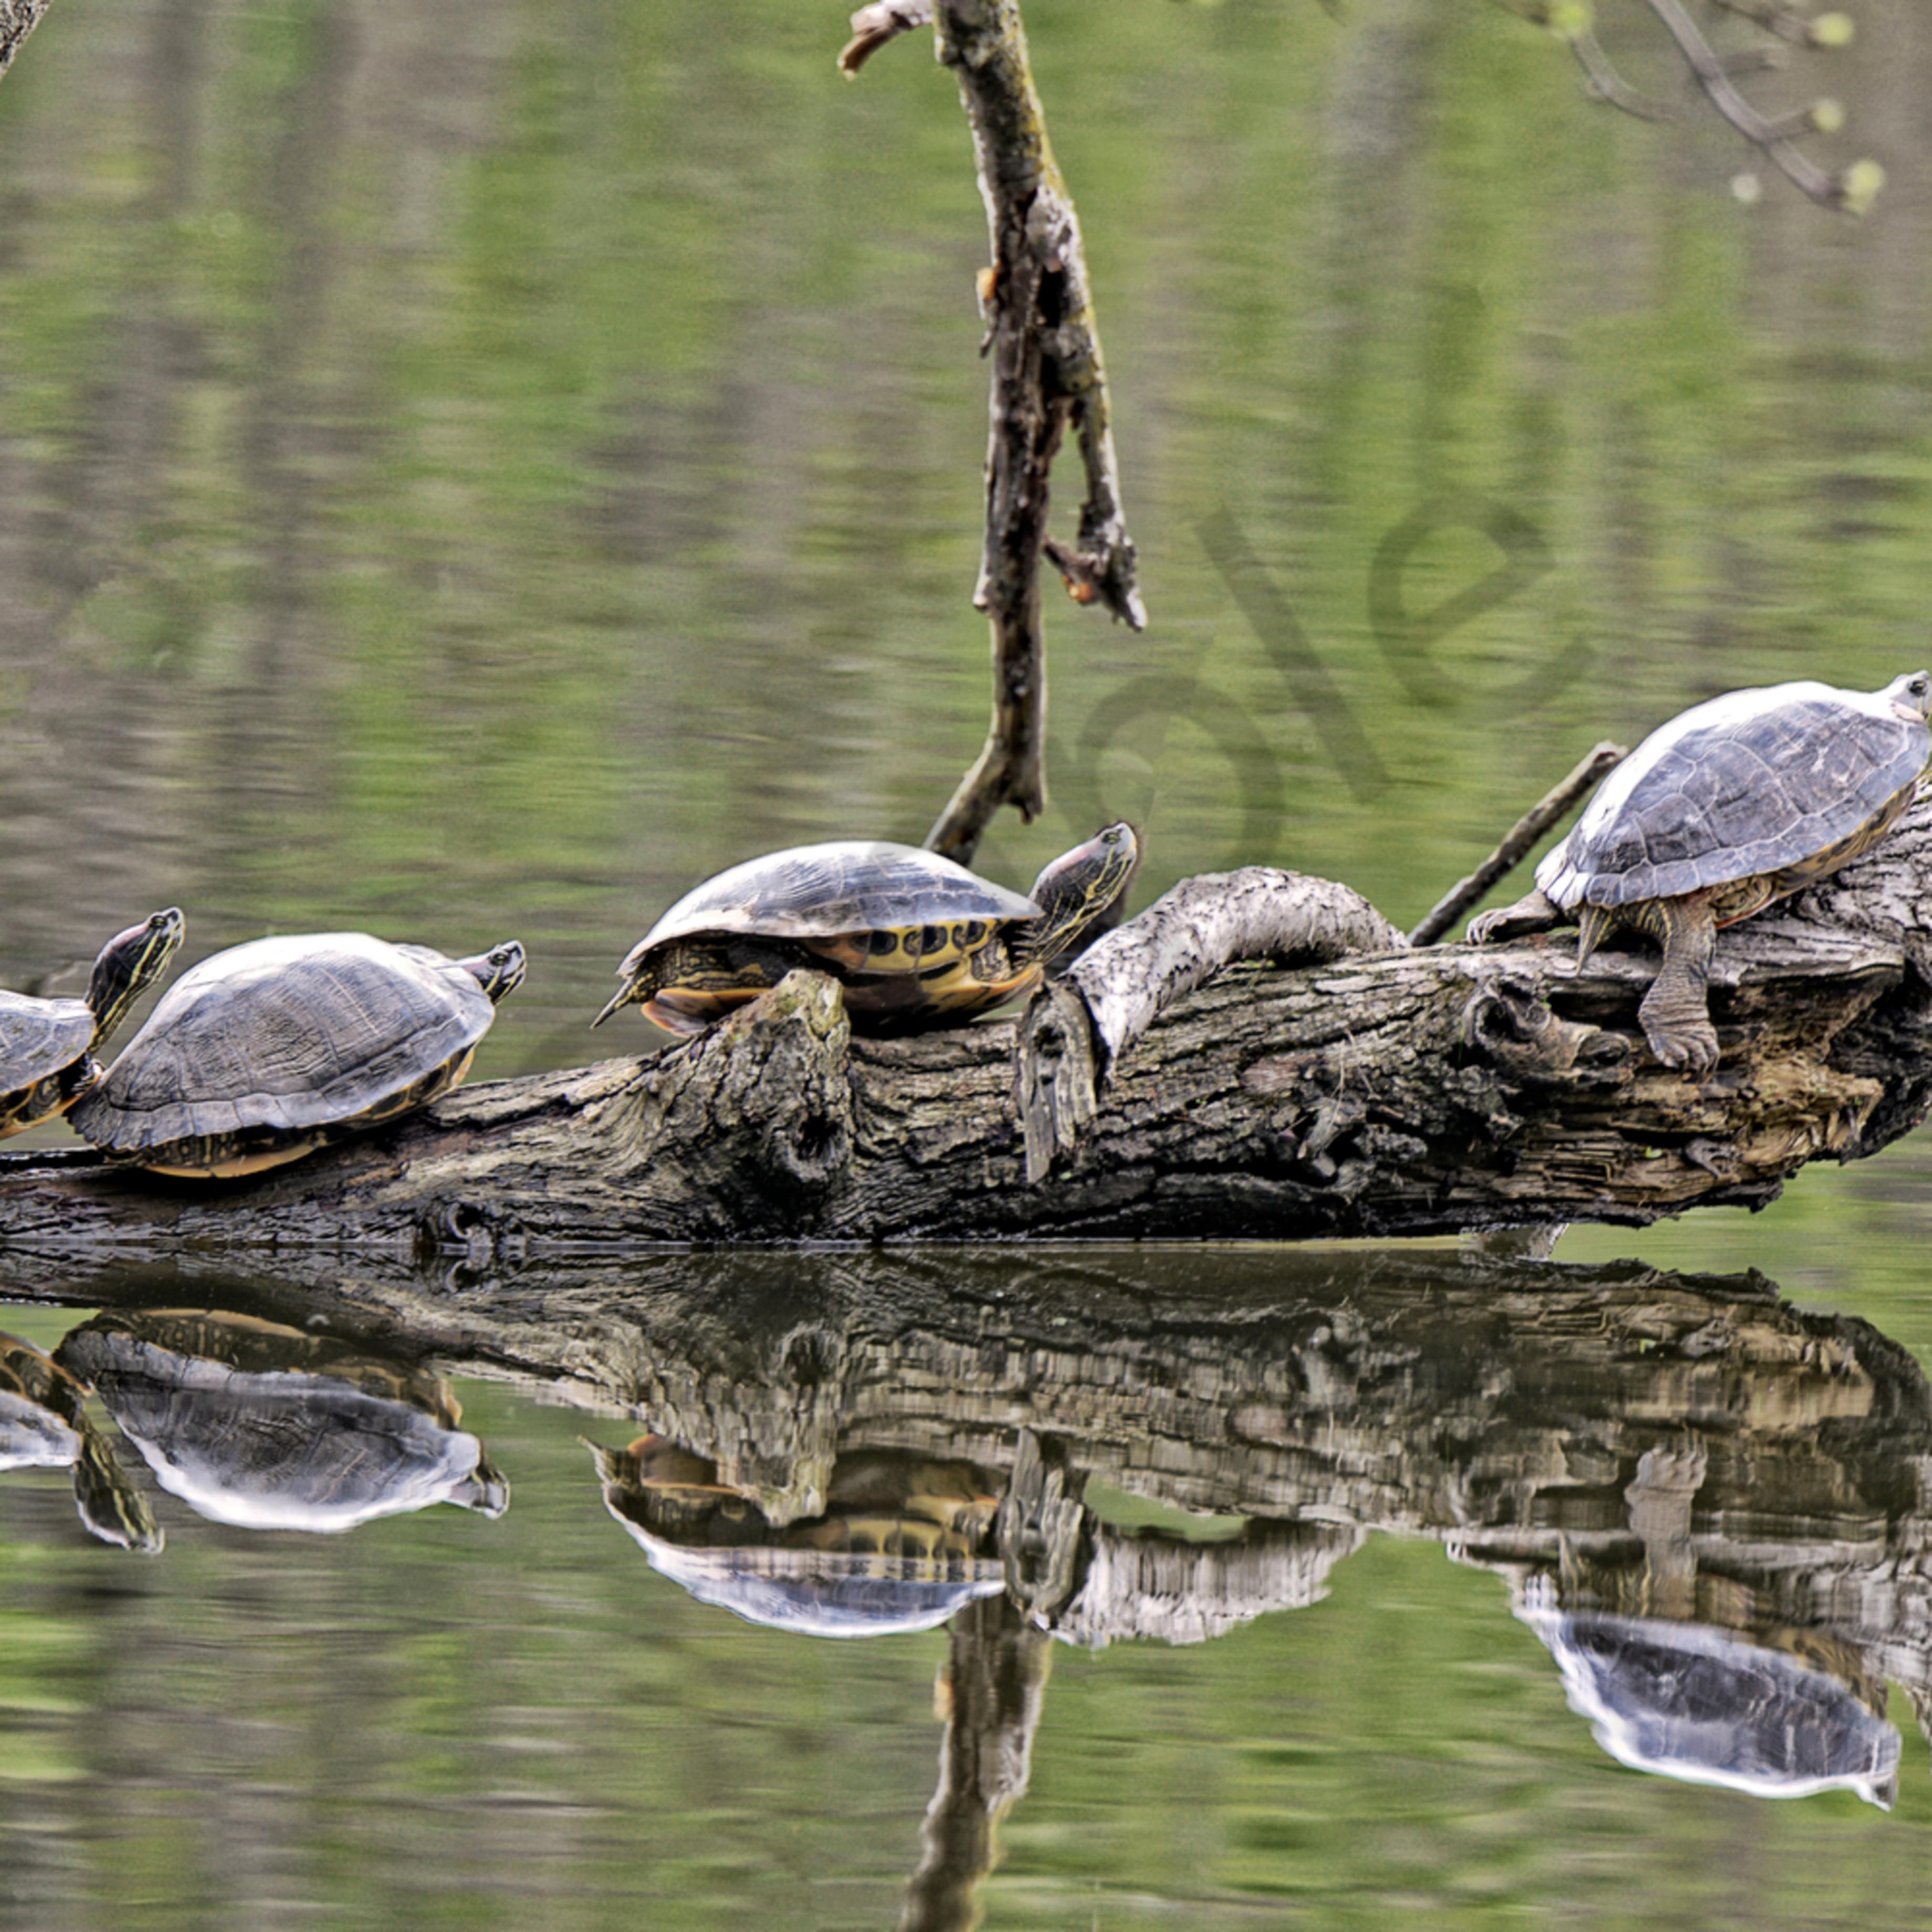 Turtle follow leader 1 of 1 pylqpn